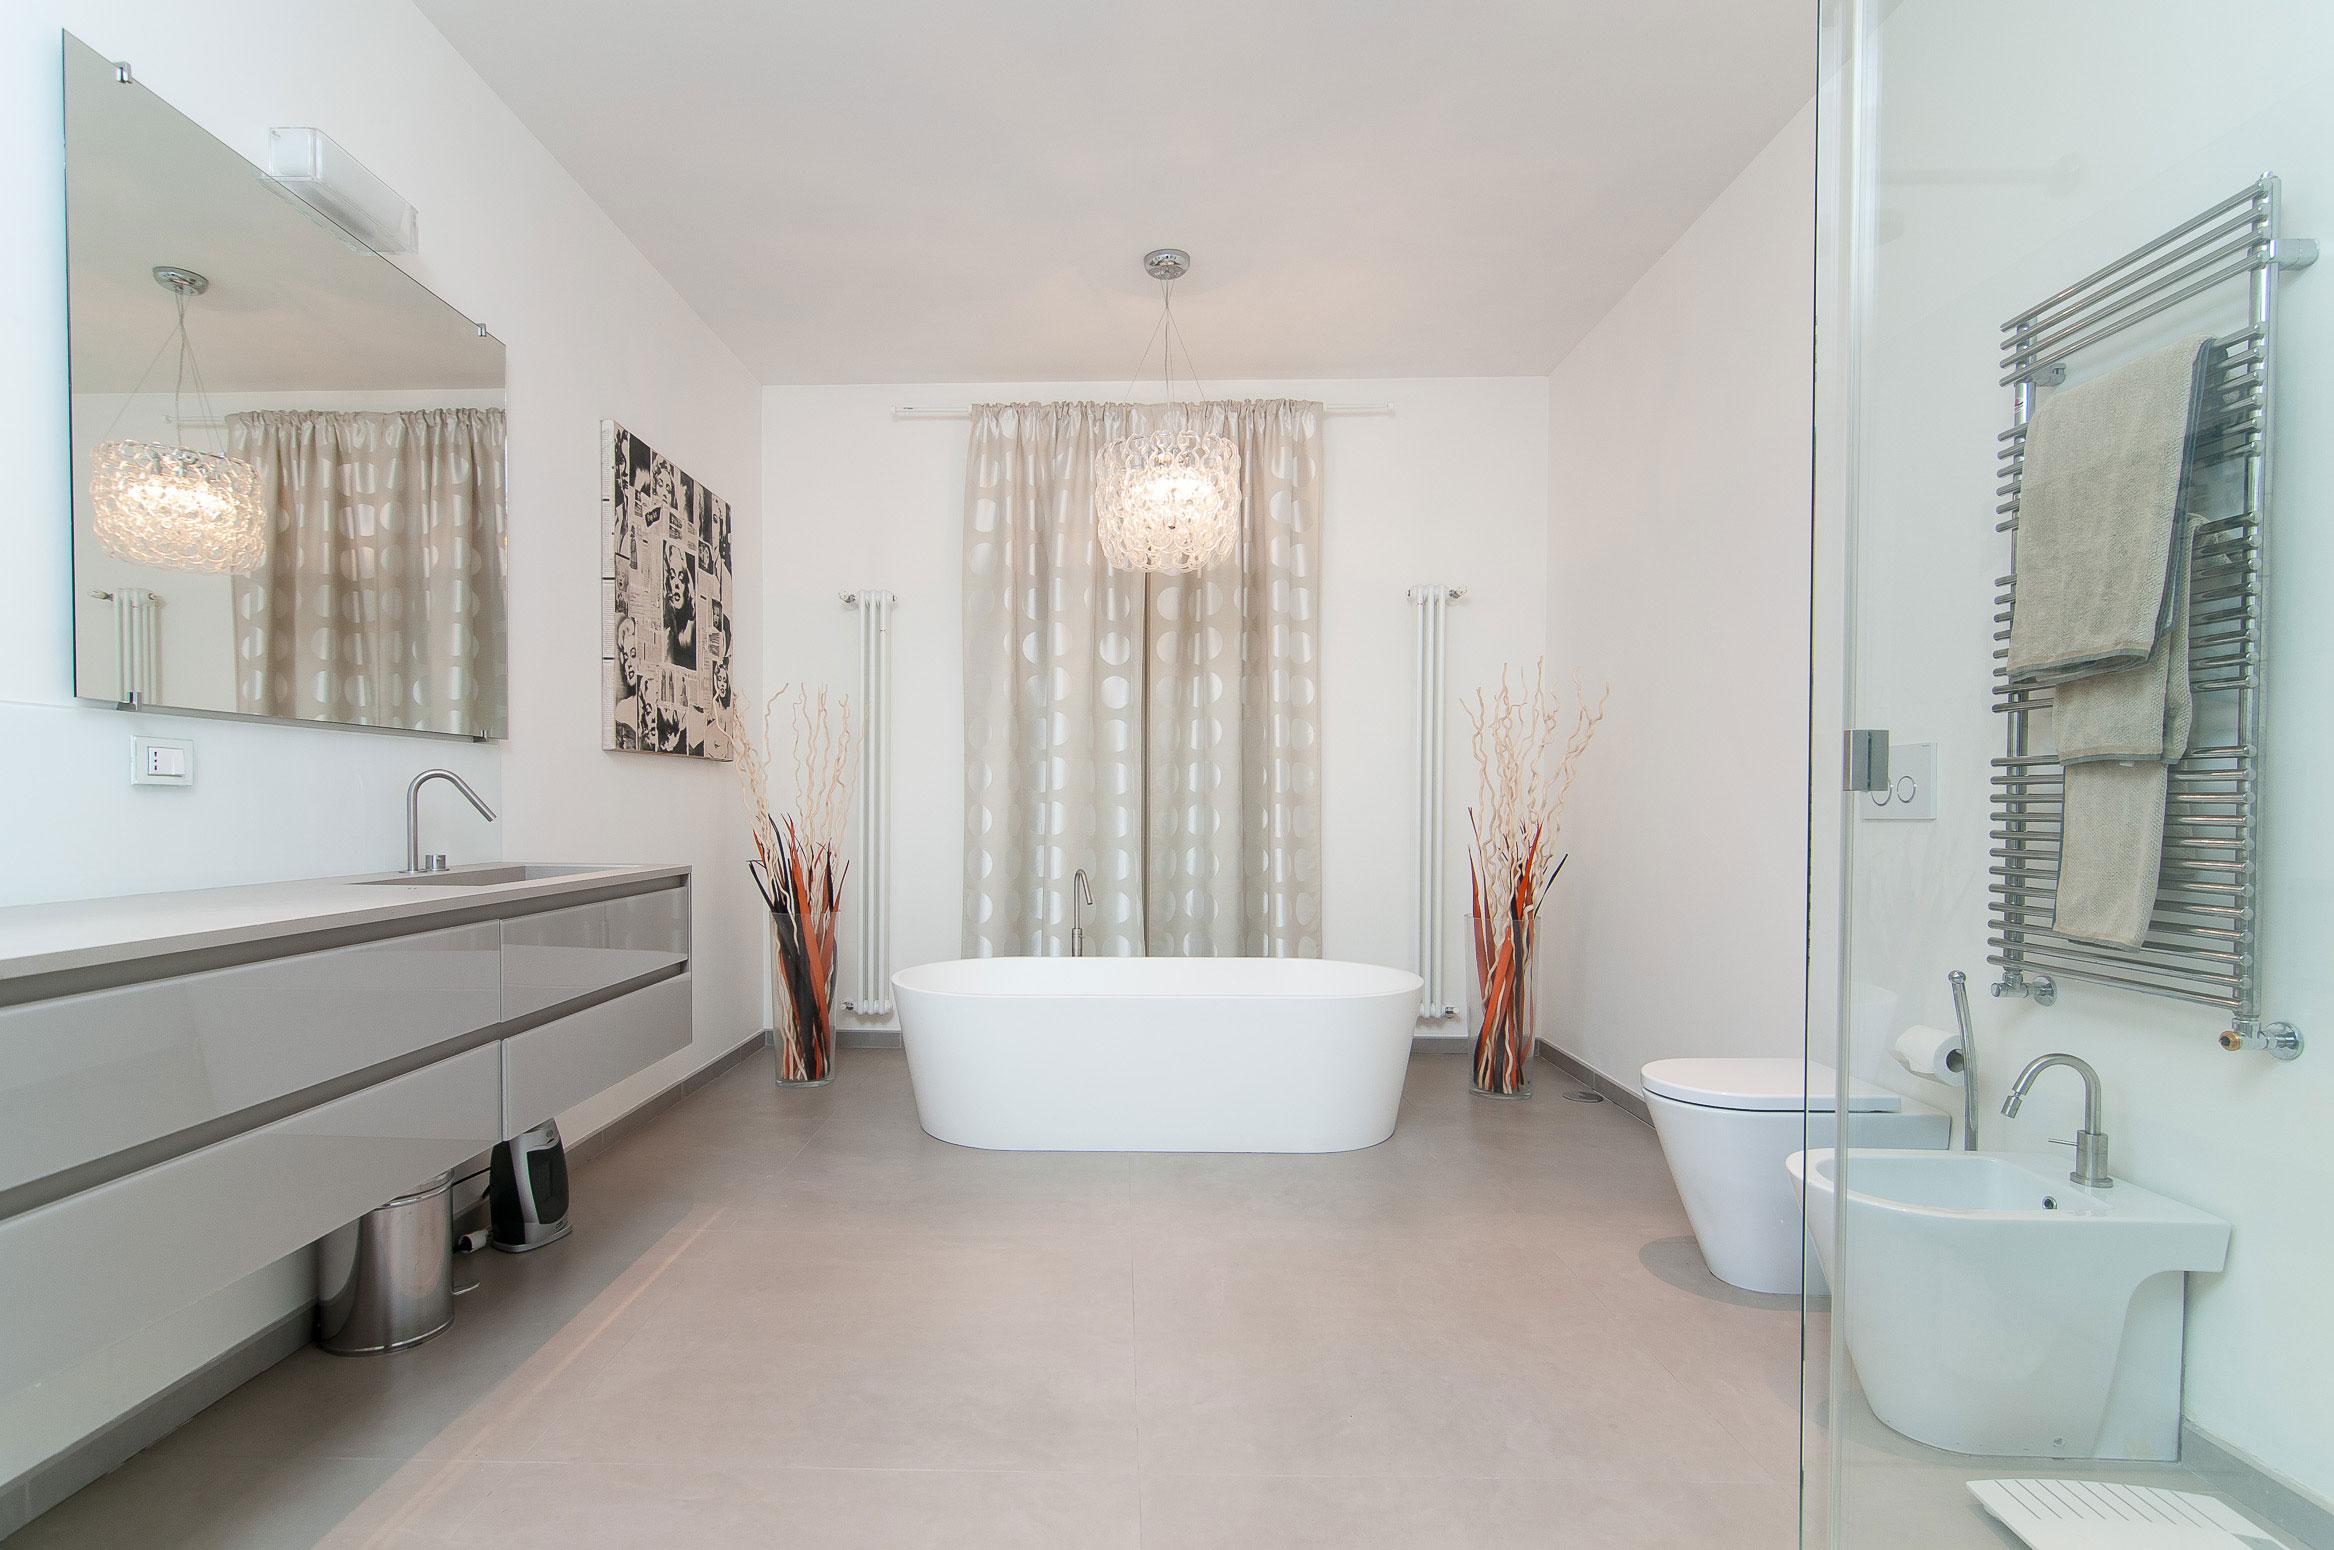 CM Apartment in Rome by 3C+t Capolei Cavalli a.a.-16